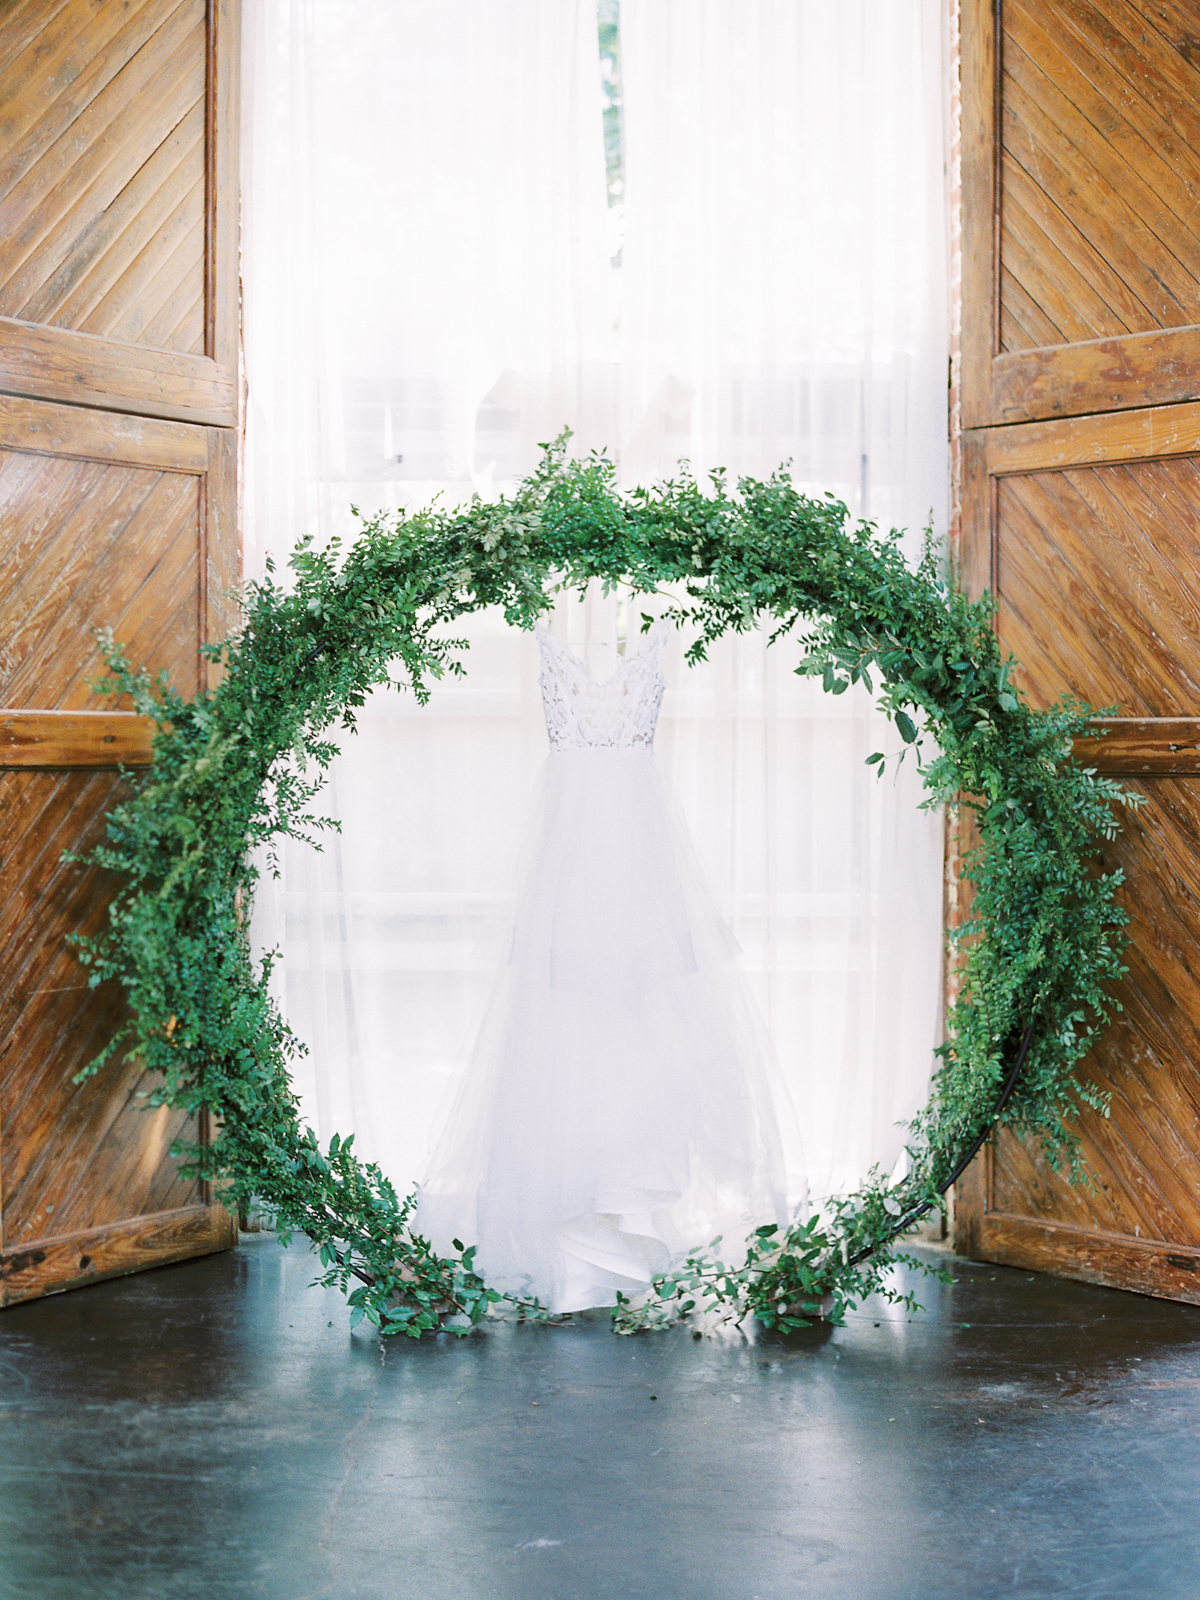 Foundry-At-Puritan-Mill-wedding-photos-venue-atlanta-fine-art-film-photographer10.JPG